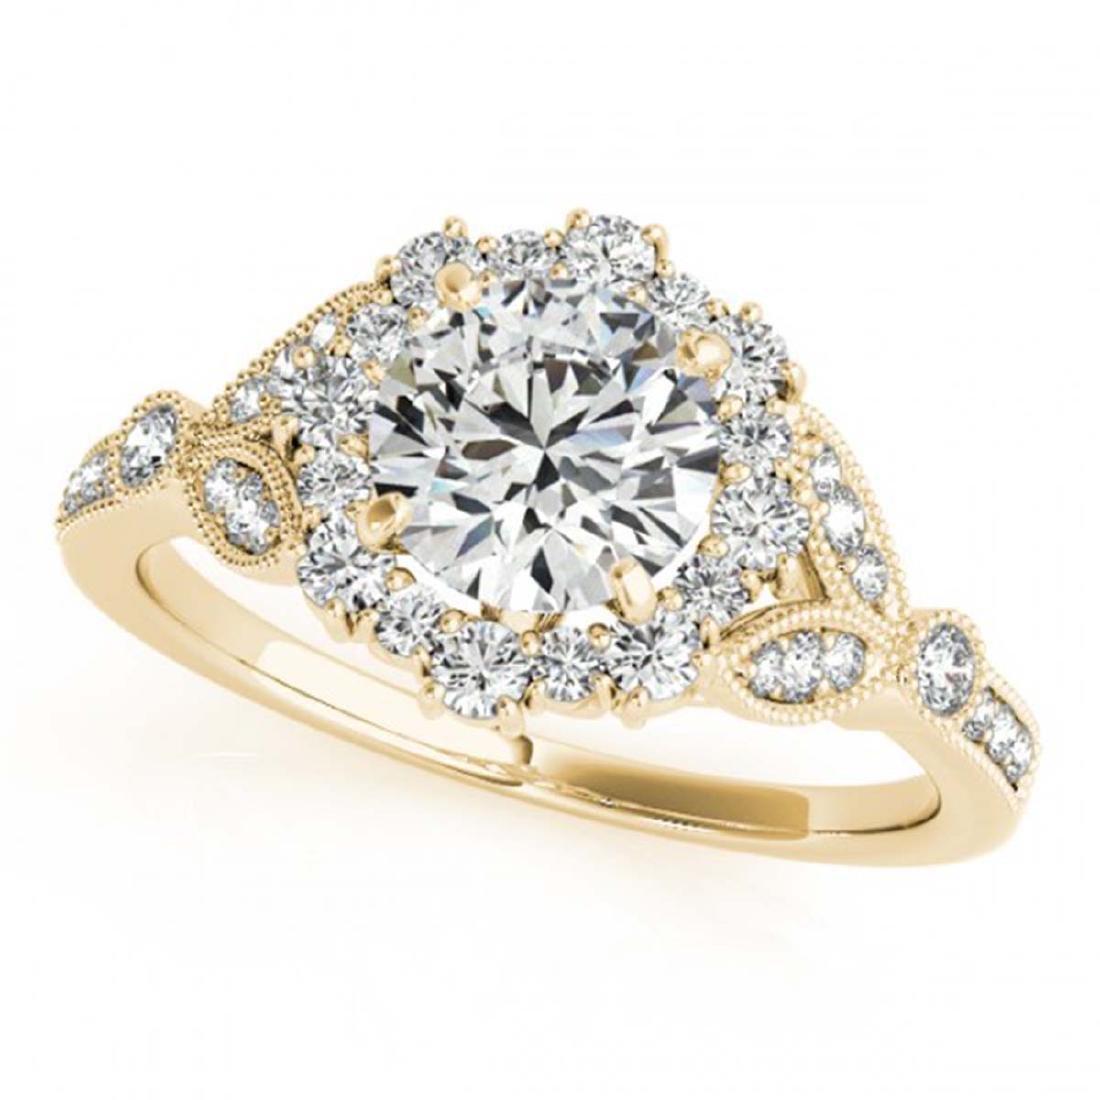 1 ctw VS/SI Diamond Halo Ring 18K Yellow Gold -